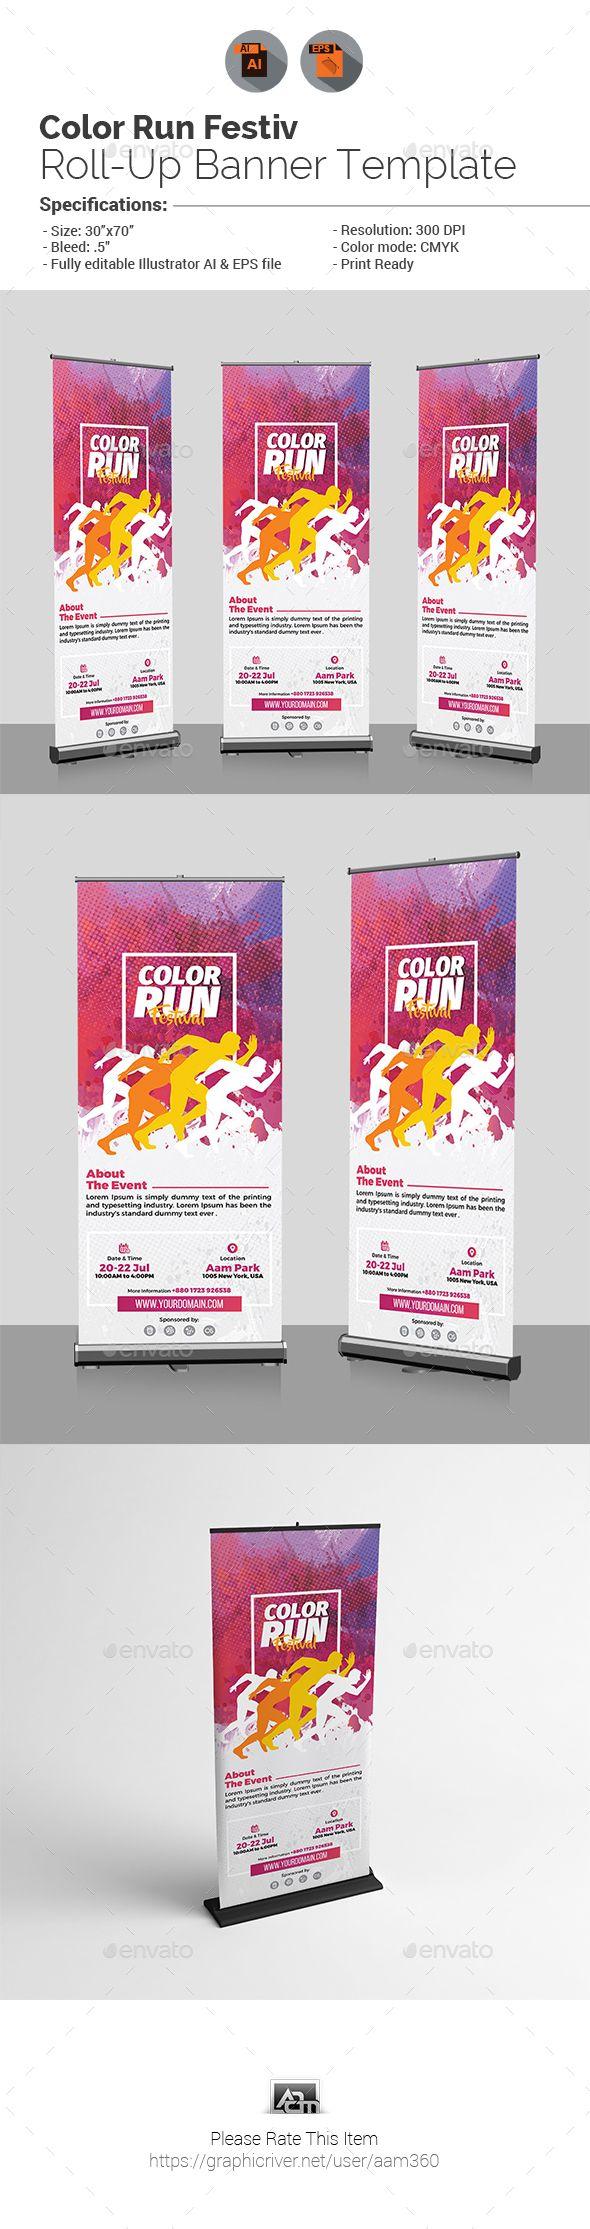 Color Run Festival Roll-Up Banner | Ai illustrator, Banner template ...